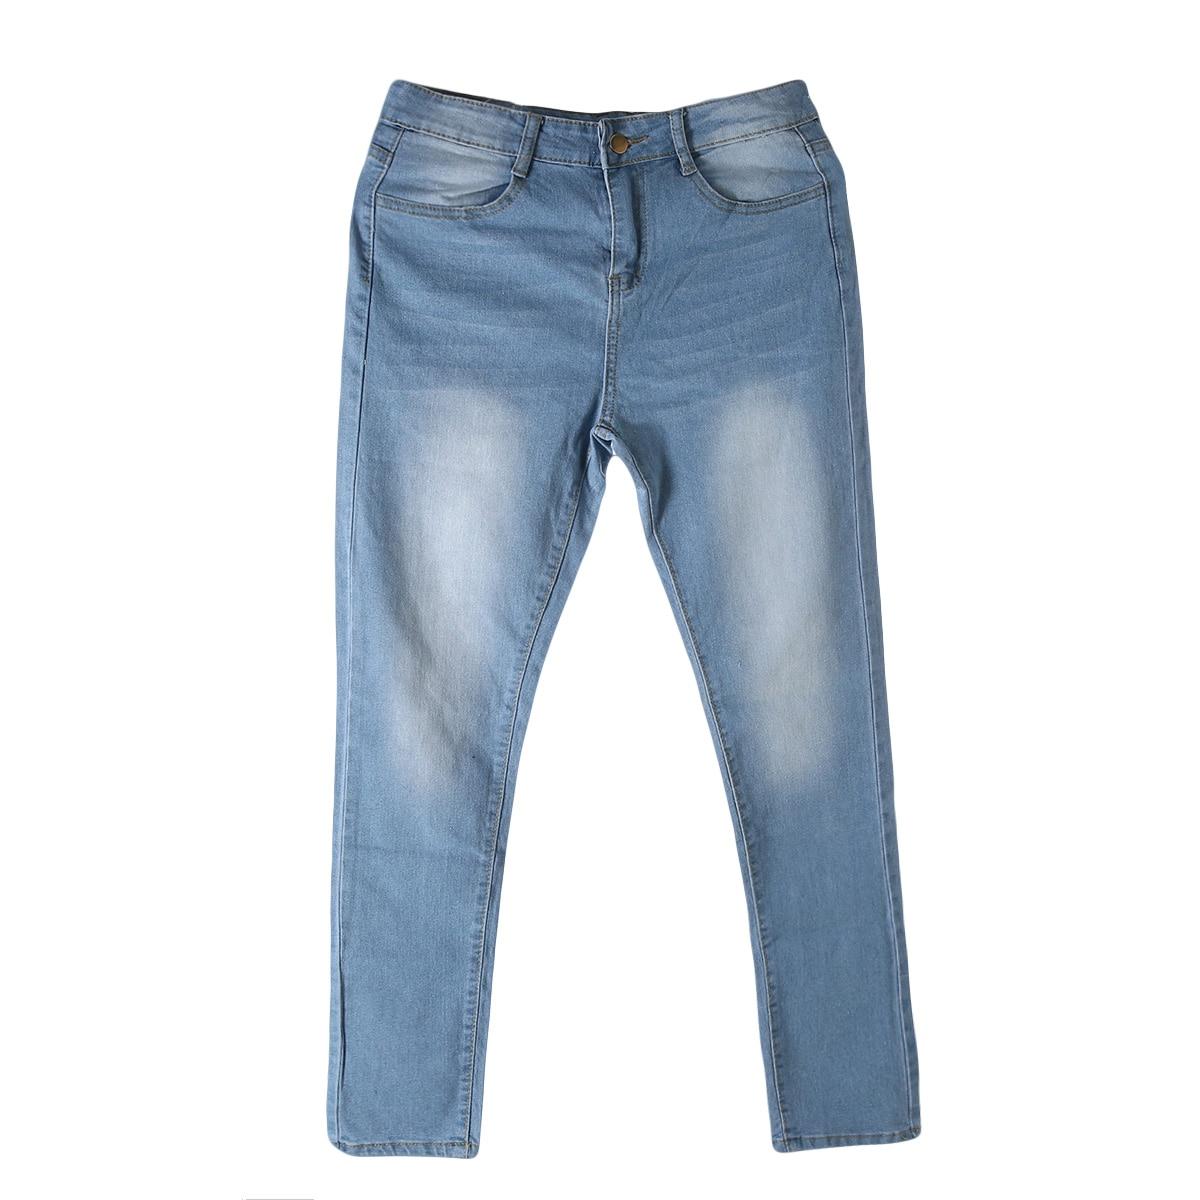 Women Lady Denim Skinny Pants High Waist Stretch Jeans Slim Pencil Jeans Women Casual Jeans 12